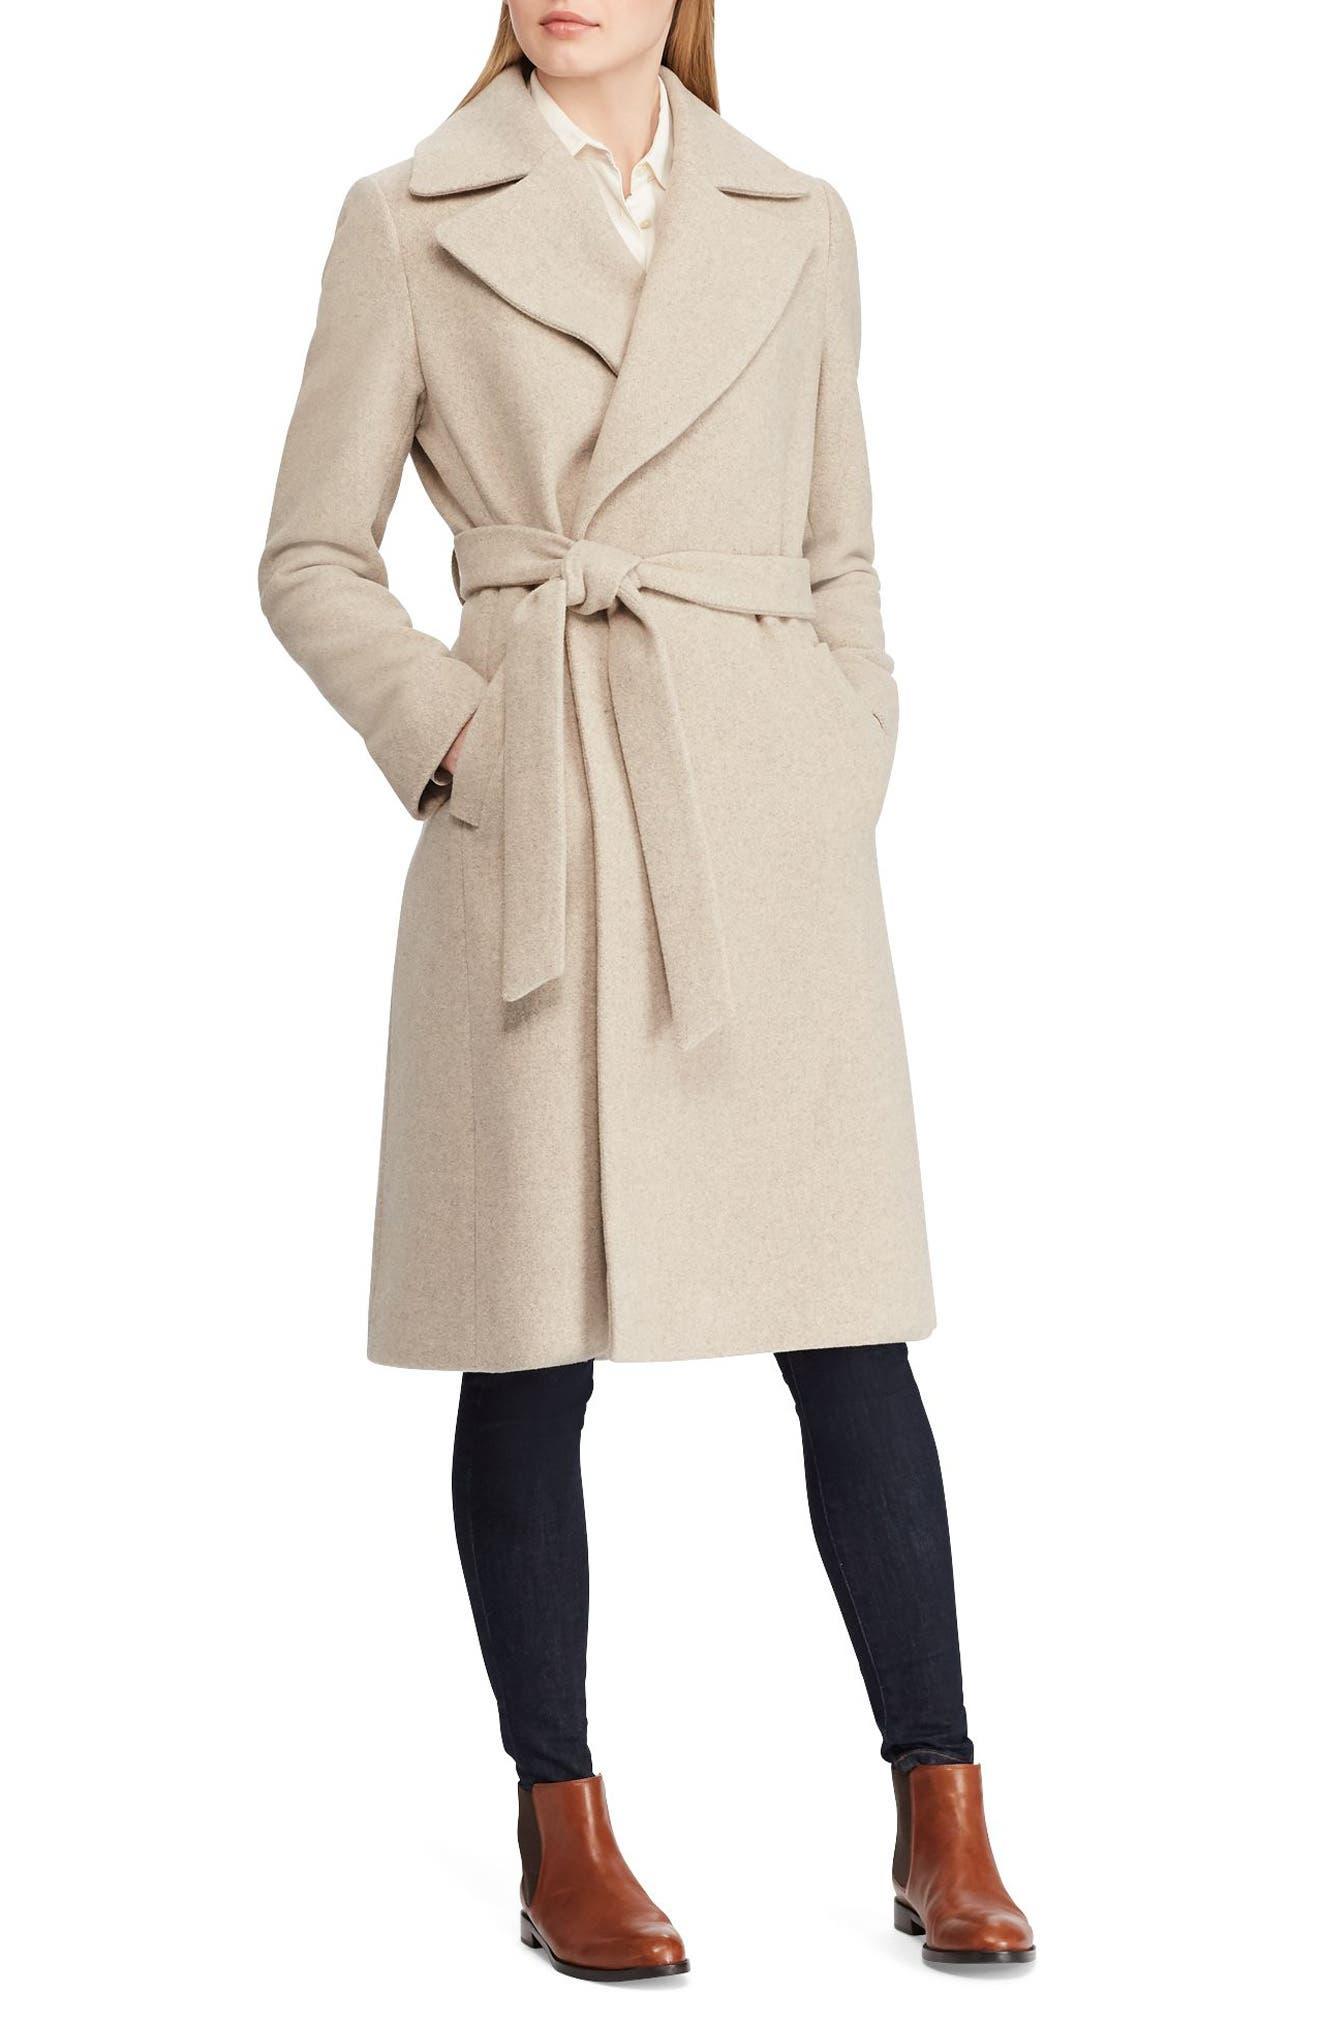 LAUREN RALPH LAUREN,                             Wool Blend Wrap Coat,                             Main thumbnail 1, color,                             063